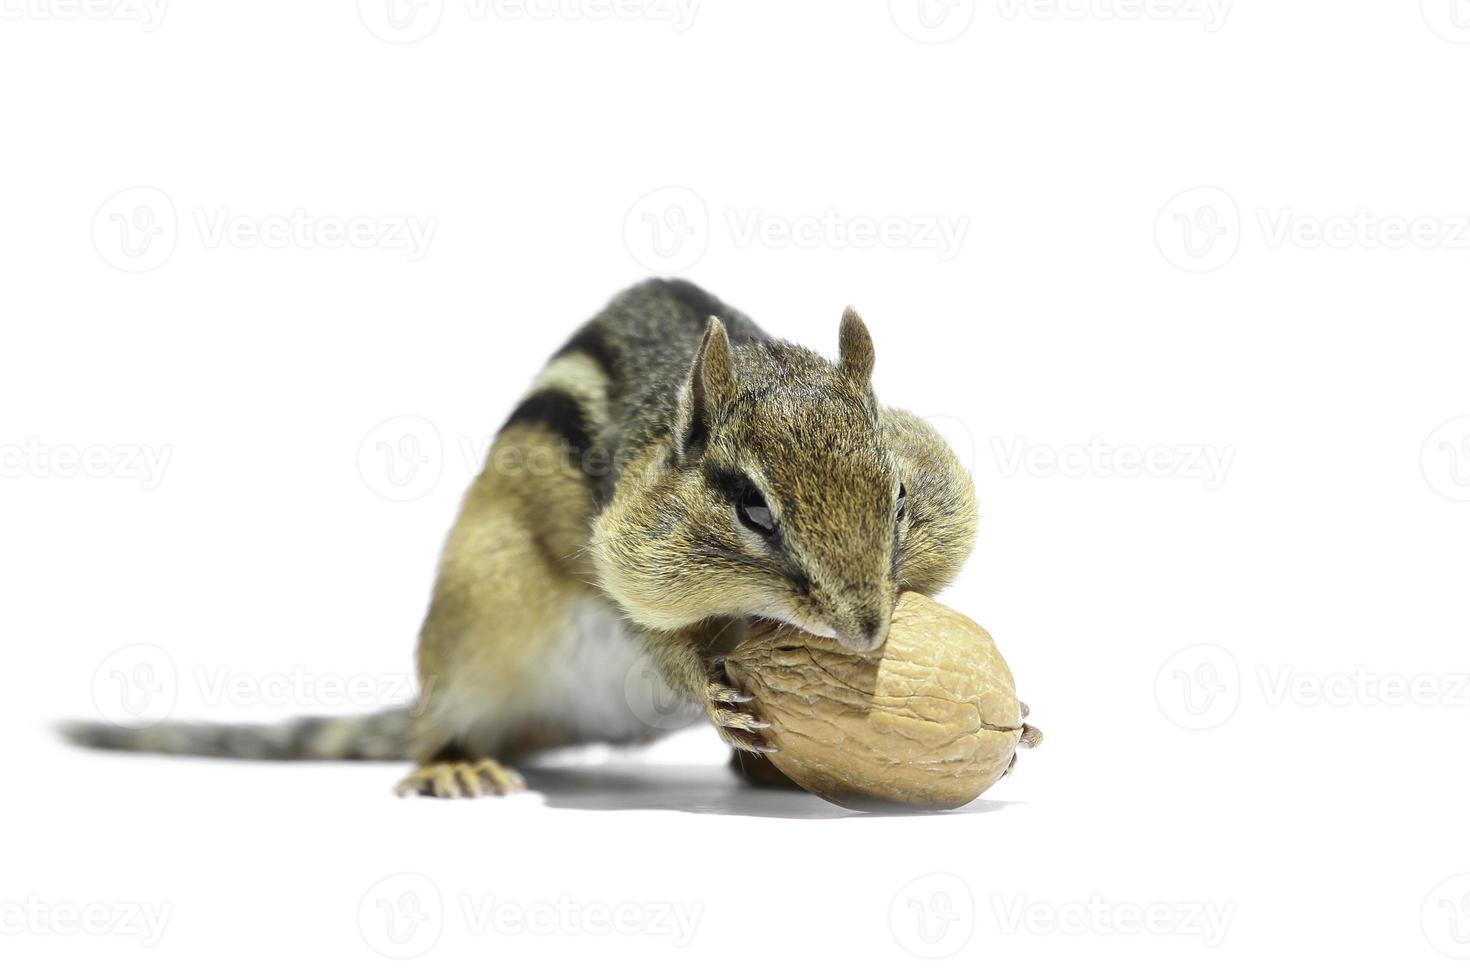 Chipmunk and Walnut photo